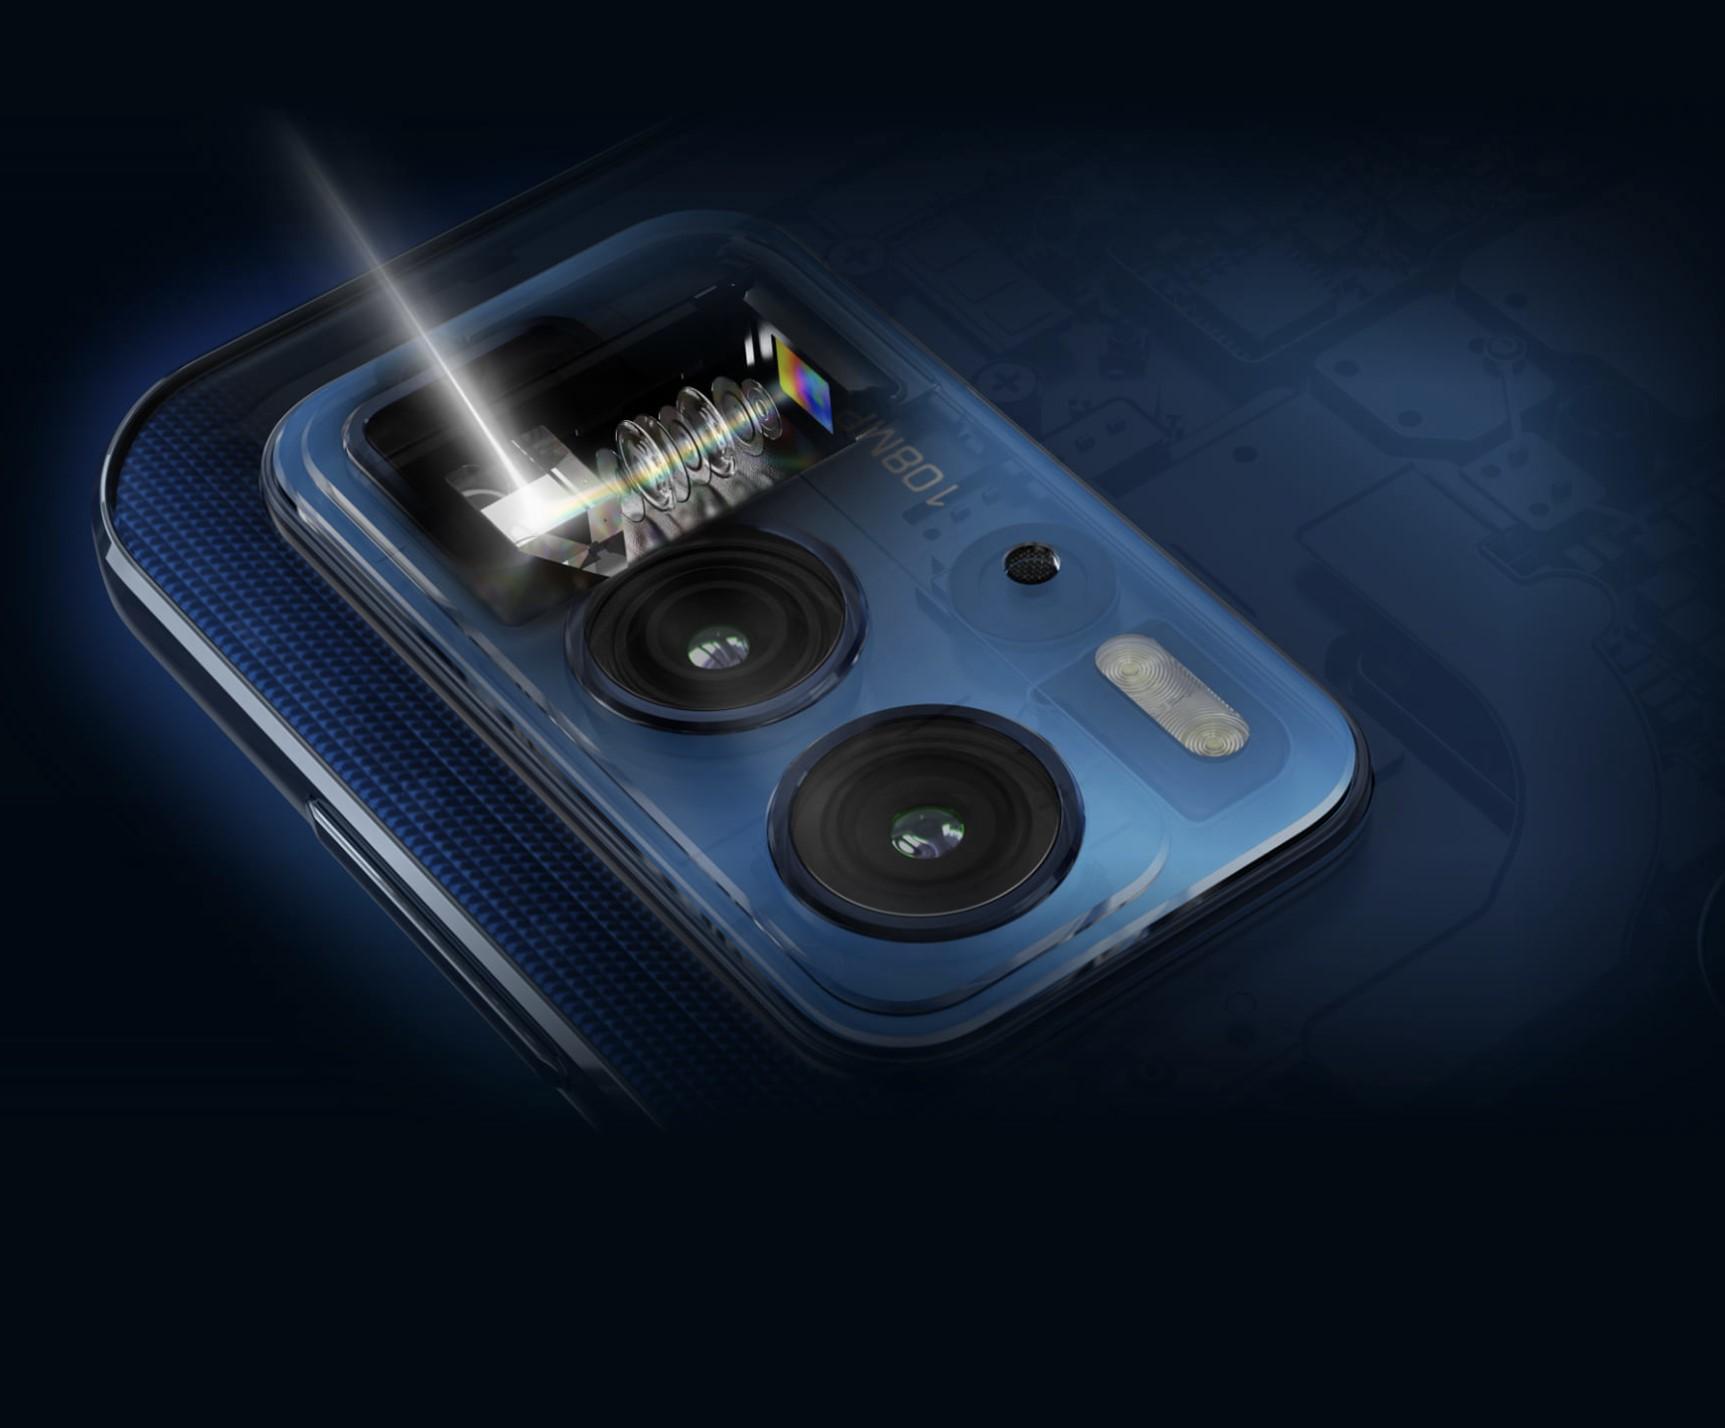 Motorola Edge 20 Pro camera 2 REVIEW: Motorola Edge 20 Pro   Spectacular Performance For $899